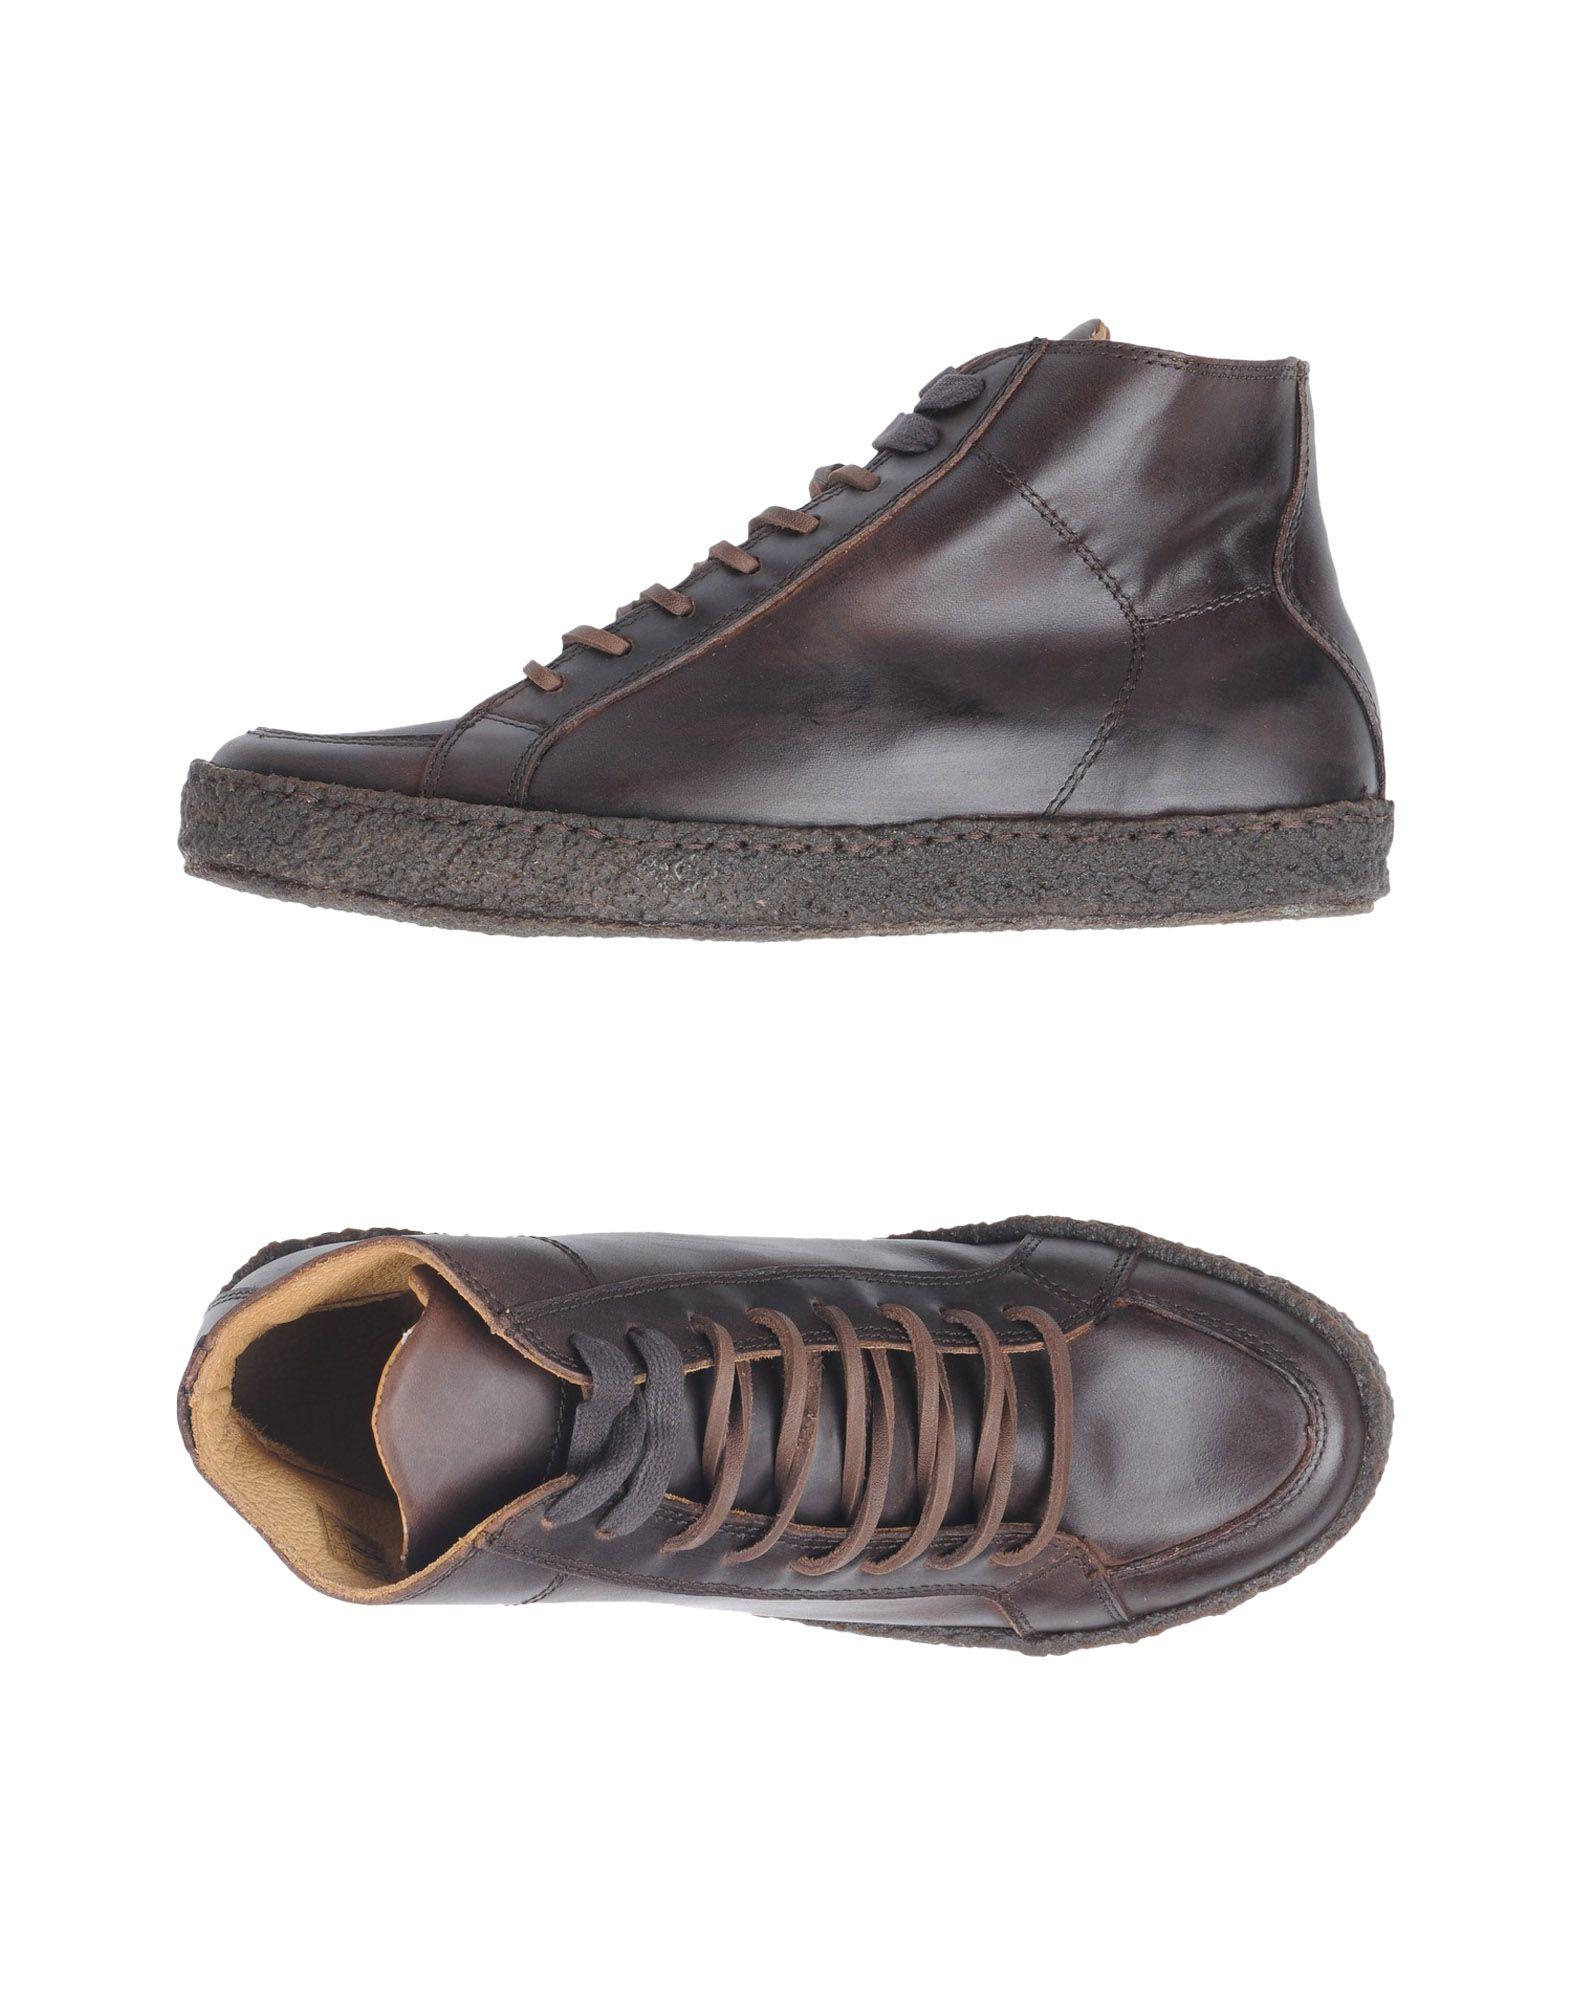 Pantofola D'oro Sneakers - Men Pantofola D'oro Sneakers - online on  Canada - Sneakers 11353960RP ea822b